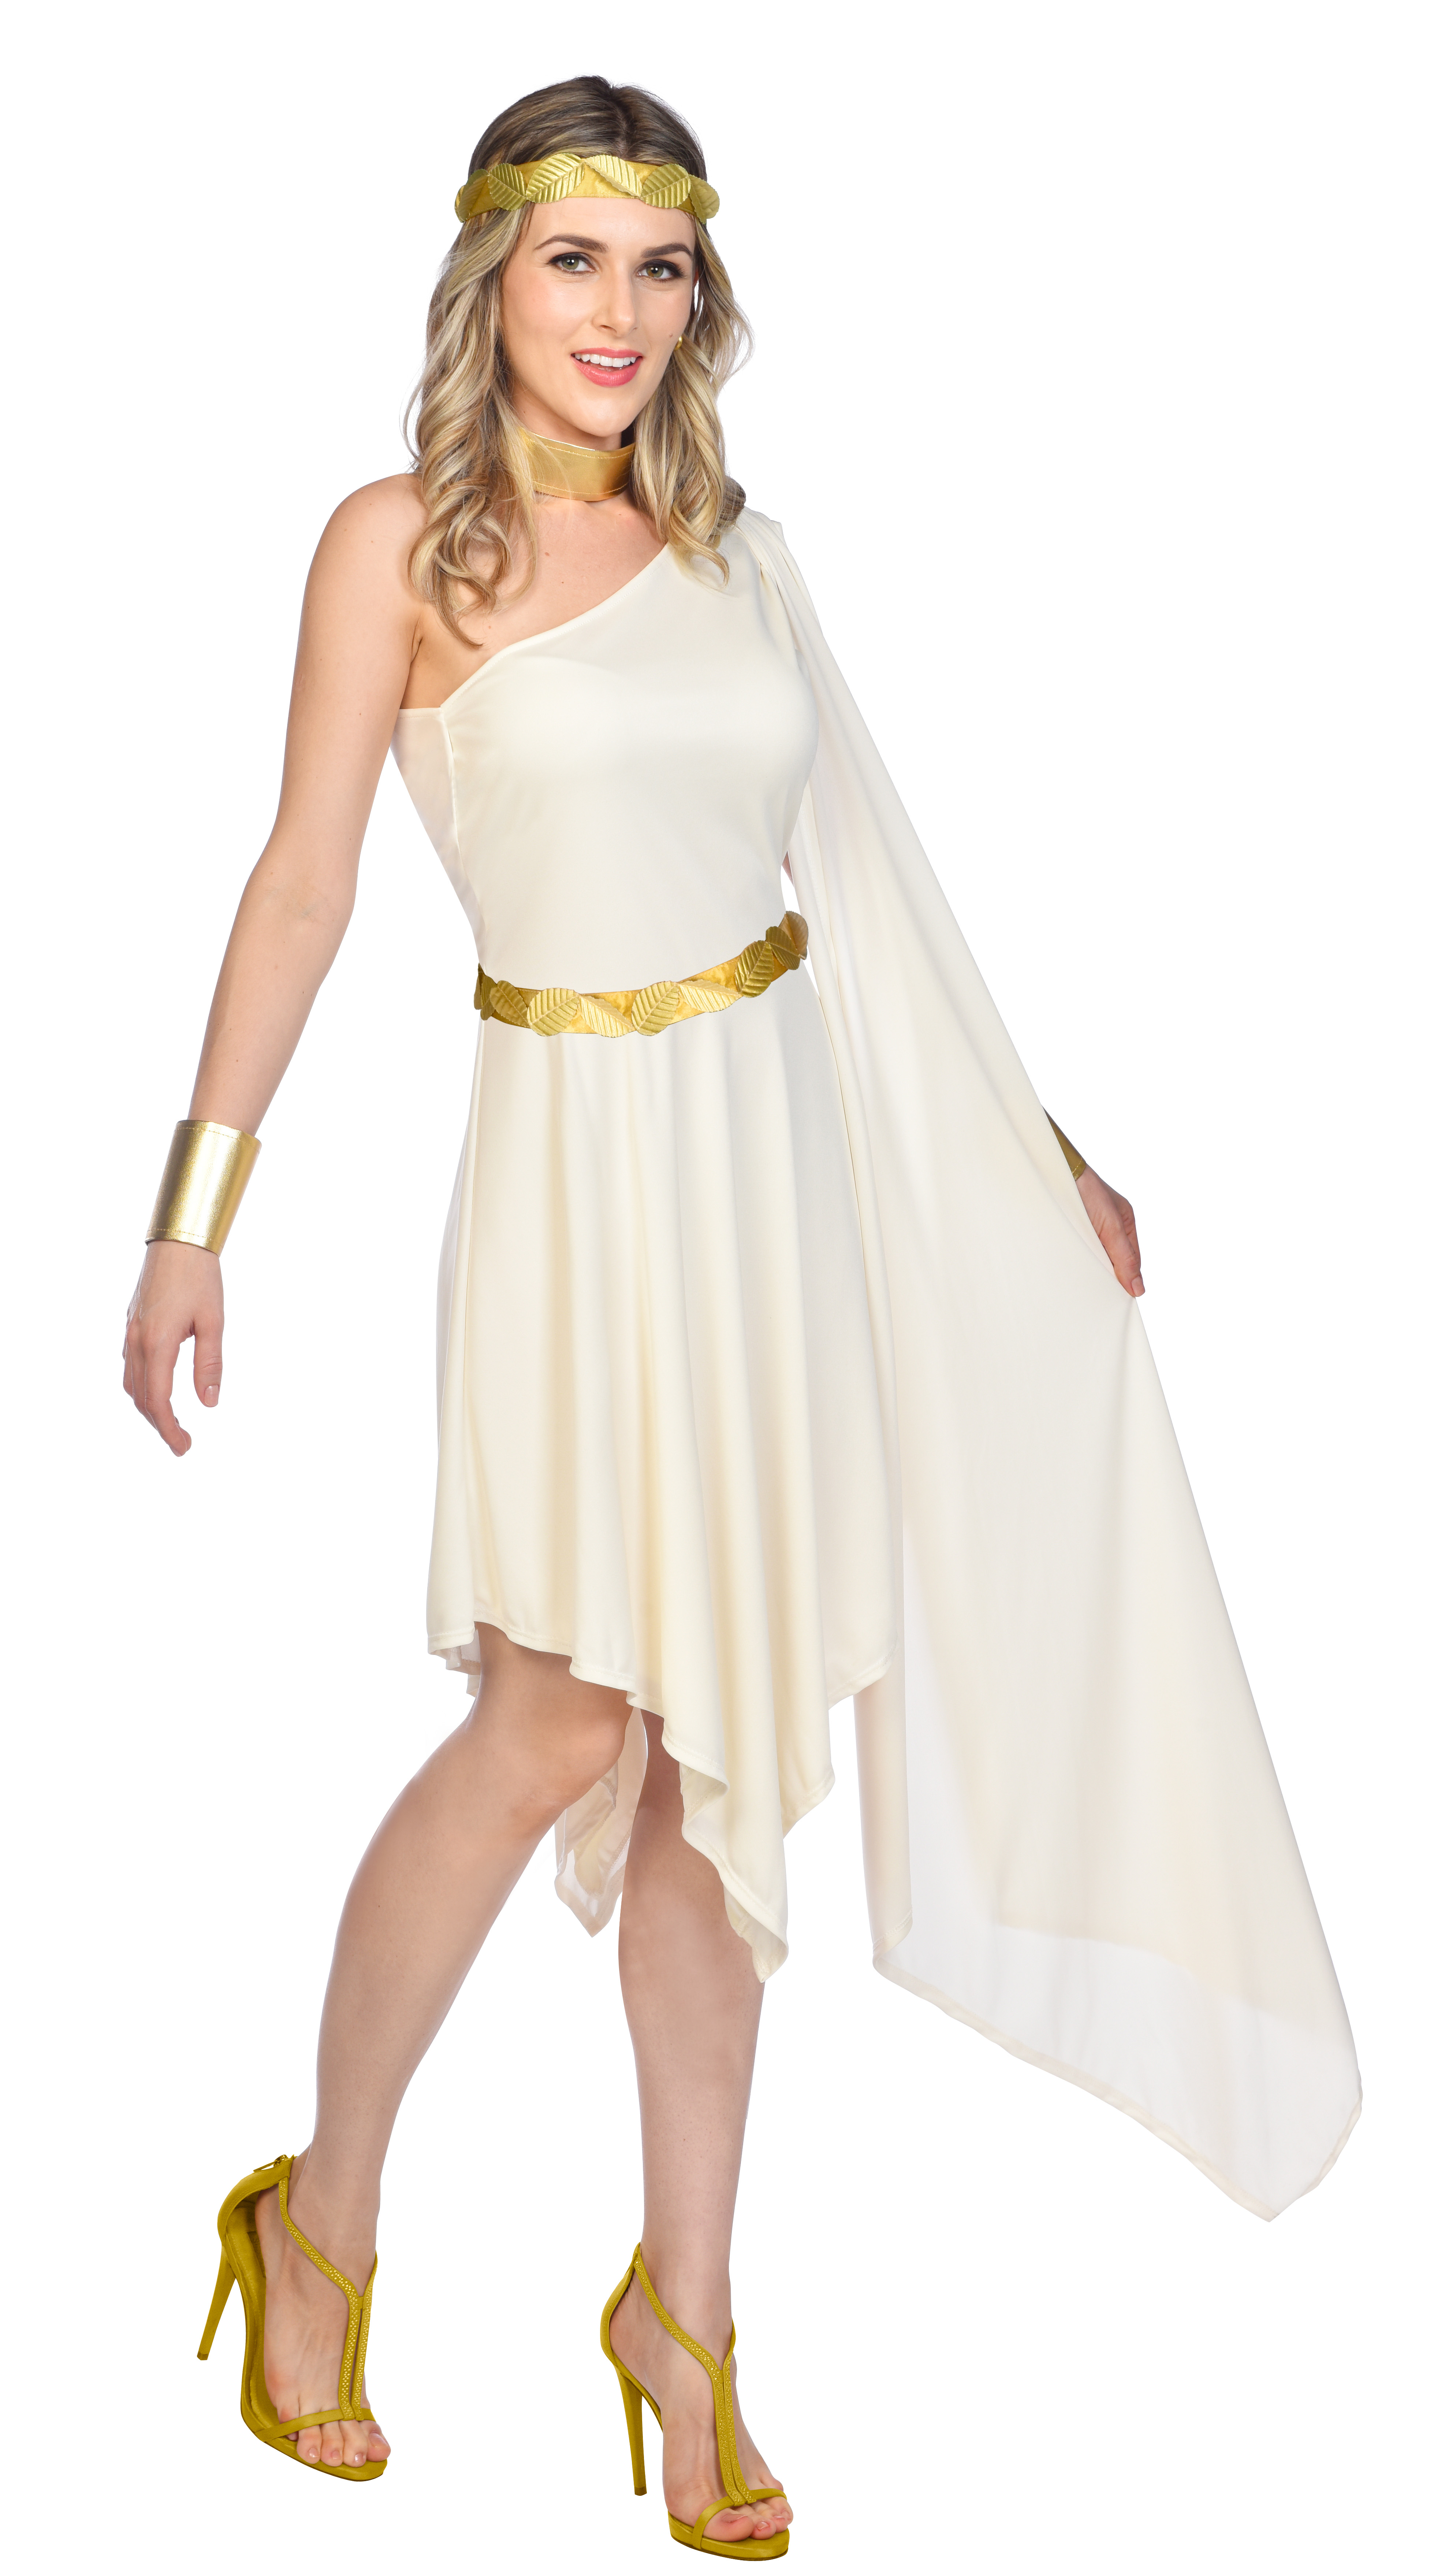 Indexbild 23 - Adult Ladies Golden Goddess Gladiator Greek Roman Toga Fancy Dress Costume New